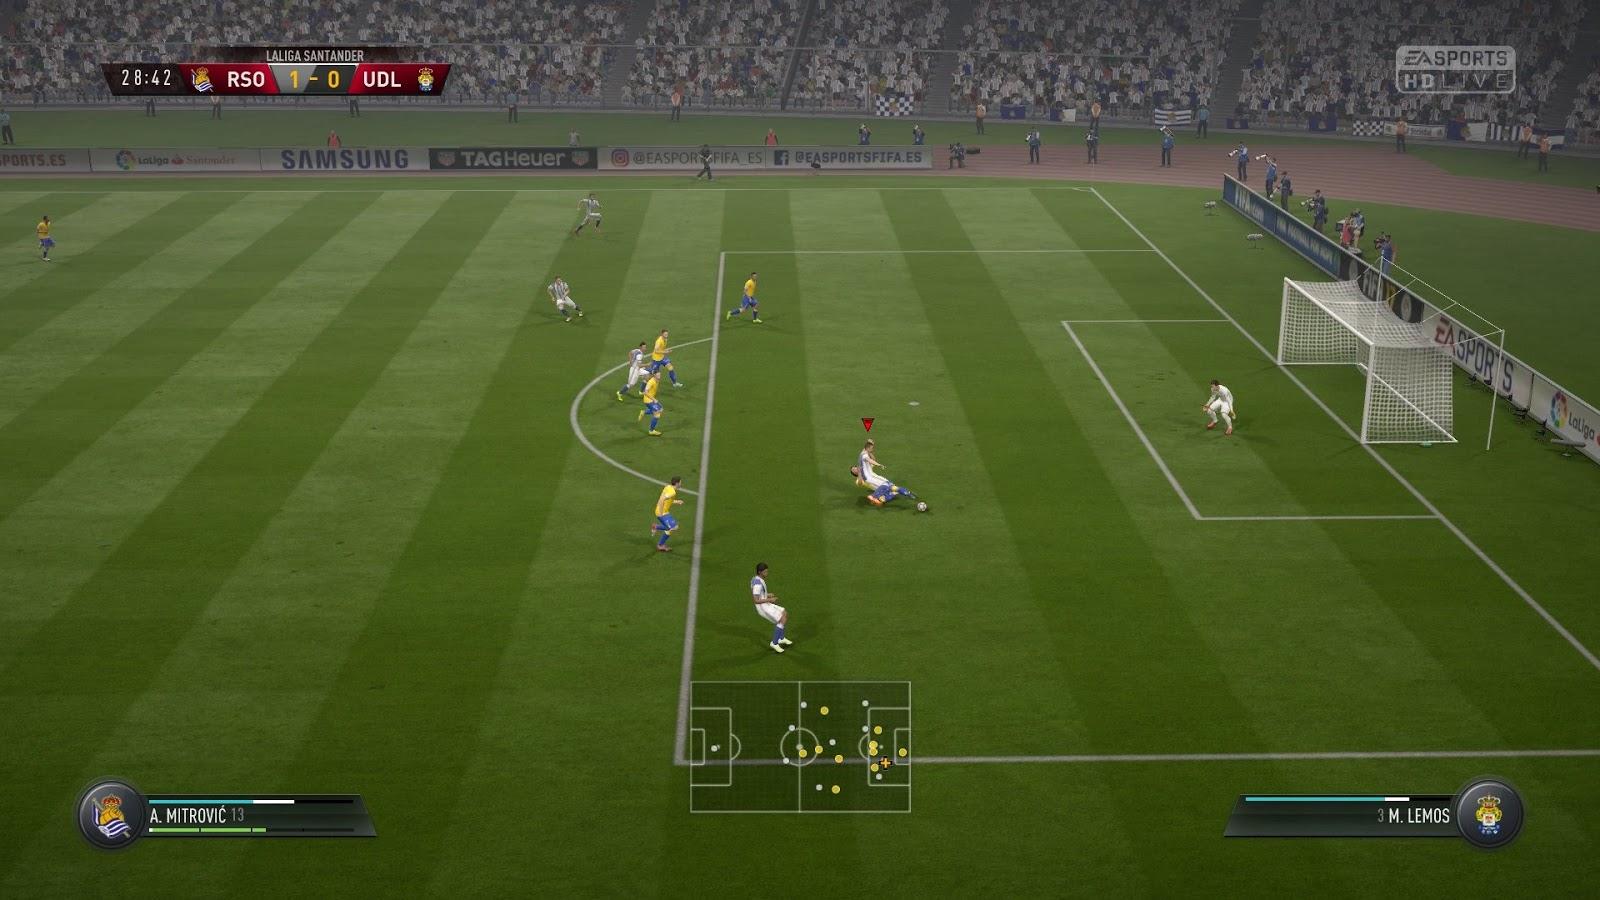 FIFA 17 ESPAÑOL PC (STEAMPUNKS) LATINO y CASTELLANO + REPACK 7 DVD5 (JPW) 5